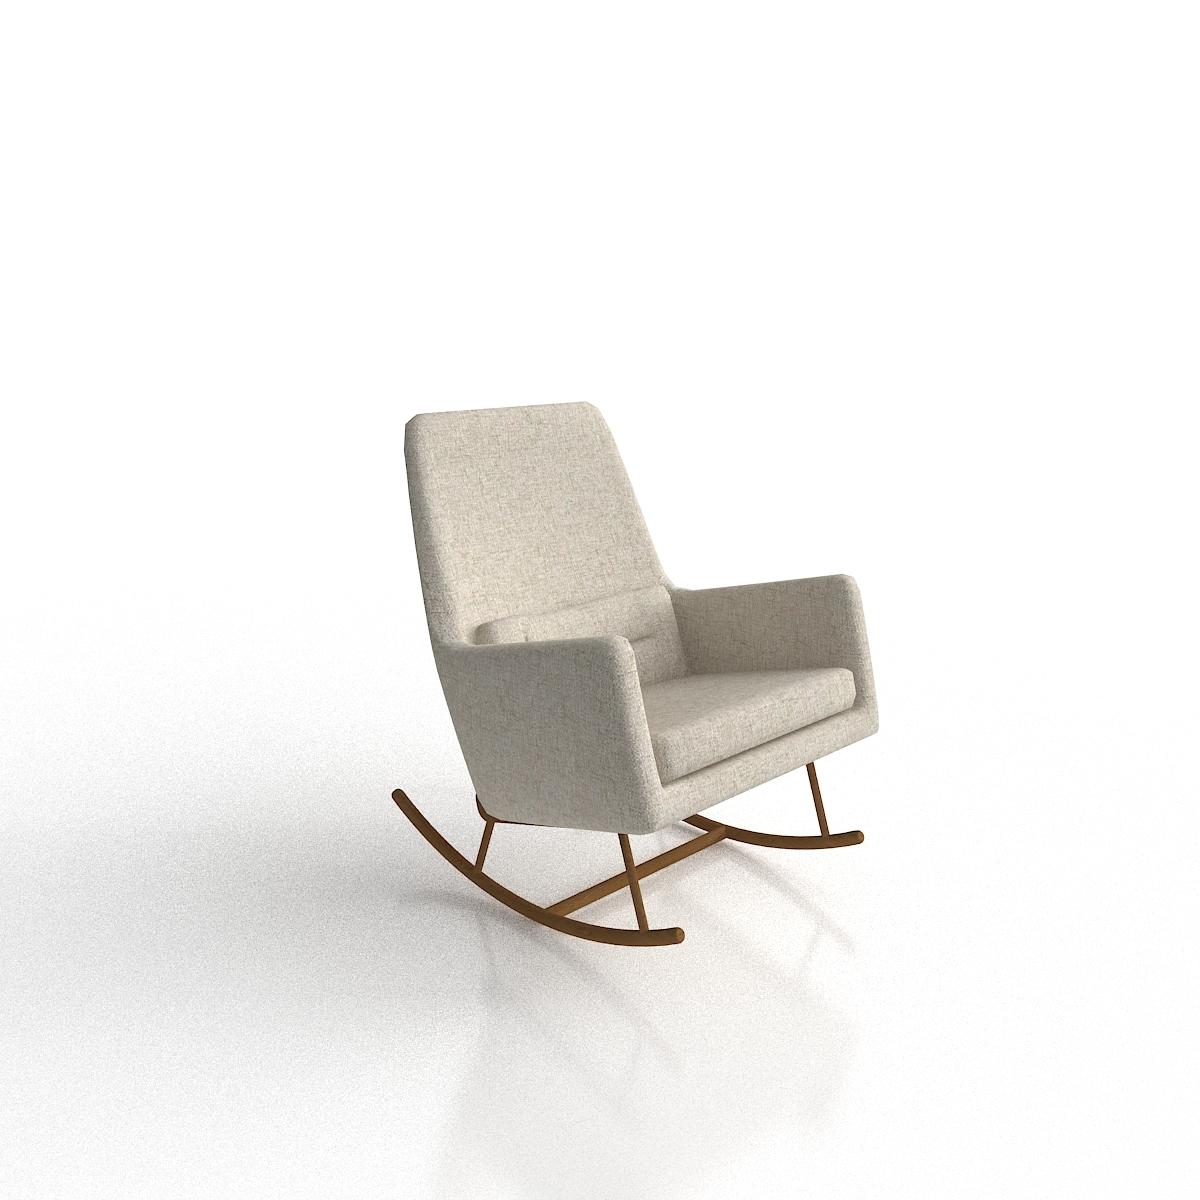 Awesome Cb2 Saic Quantam Rocking Chair Pdpeps Interior Chair Design Pdpepsorg